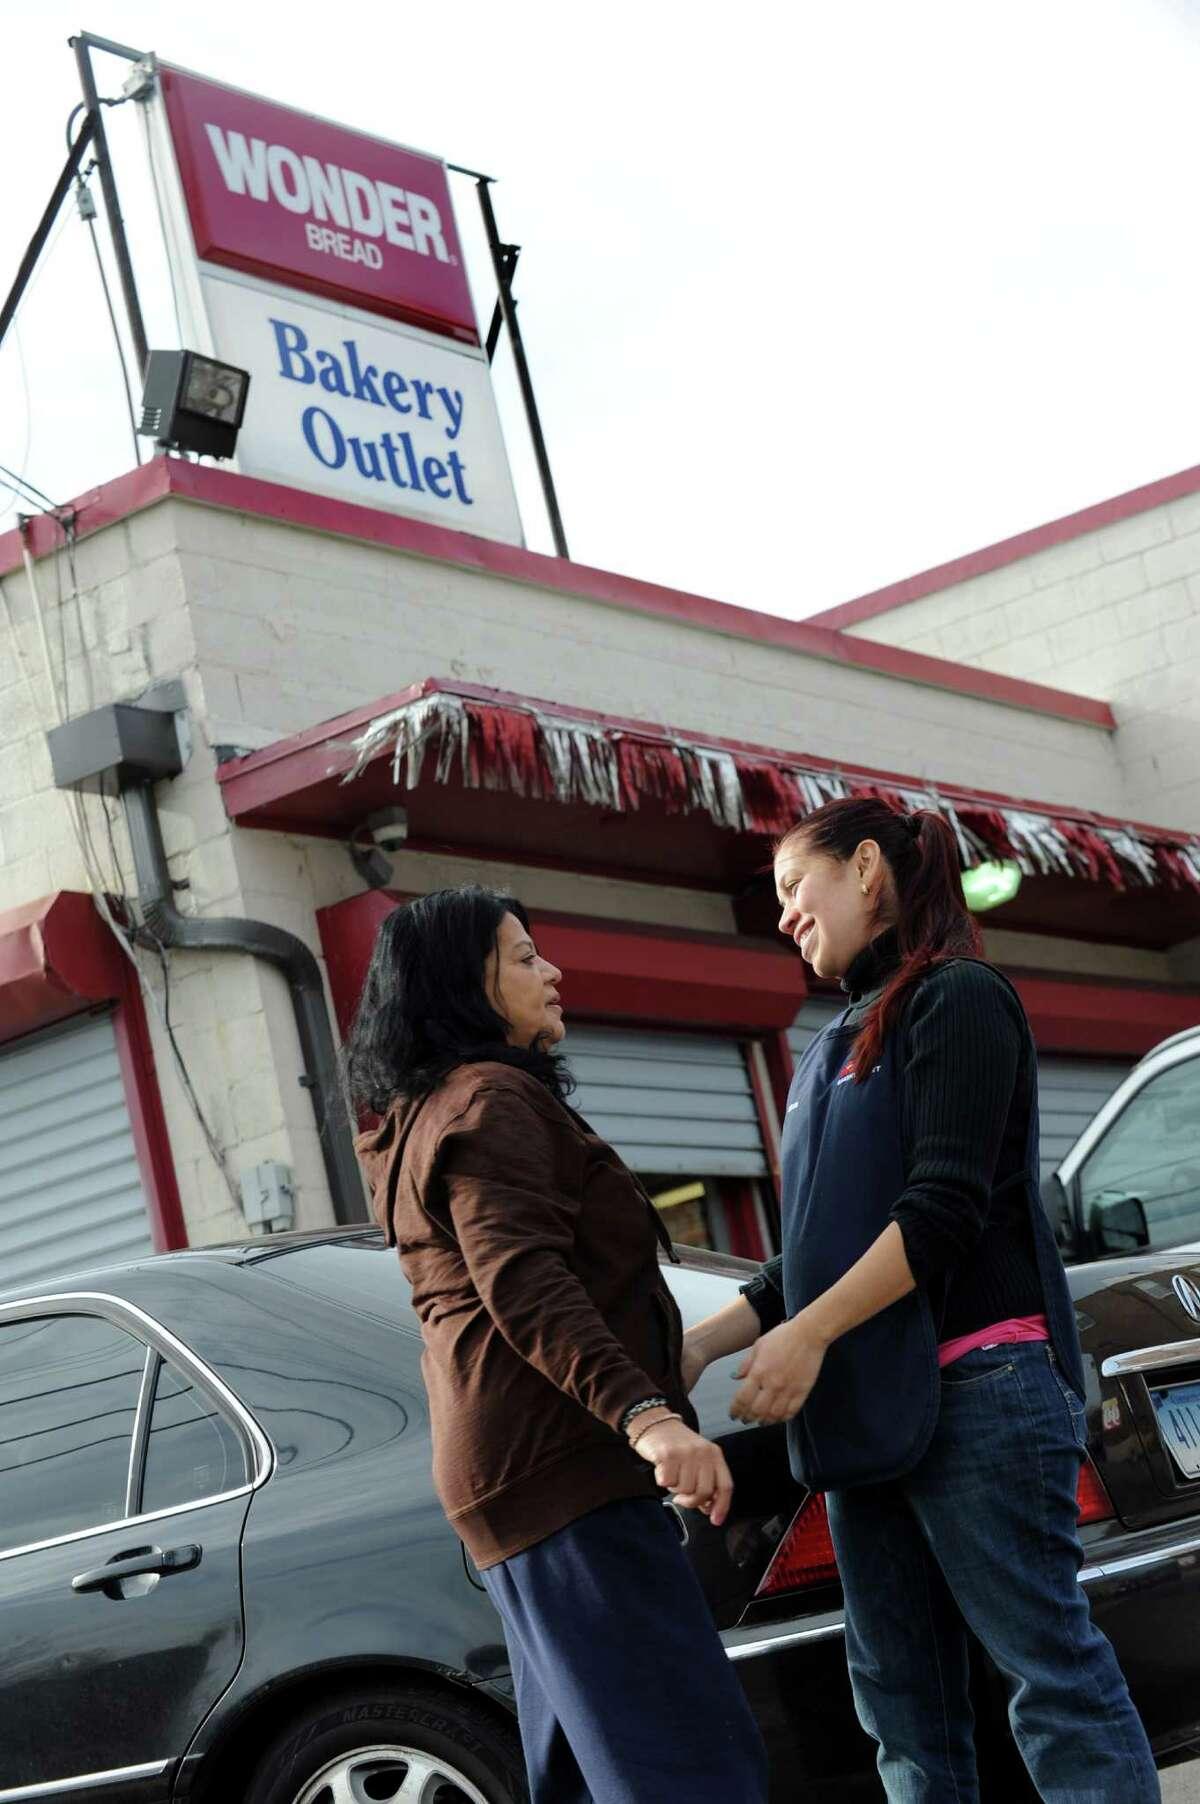 The Wonder Bread Bakery Outlet on Wells Street in Bridgeport, Conn. on Friday, Nov. 16, 2012.